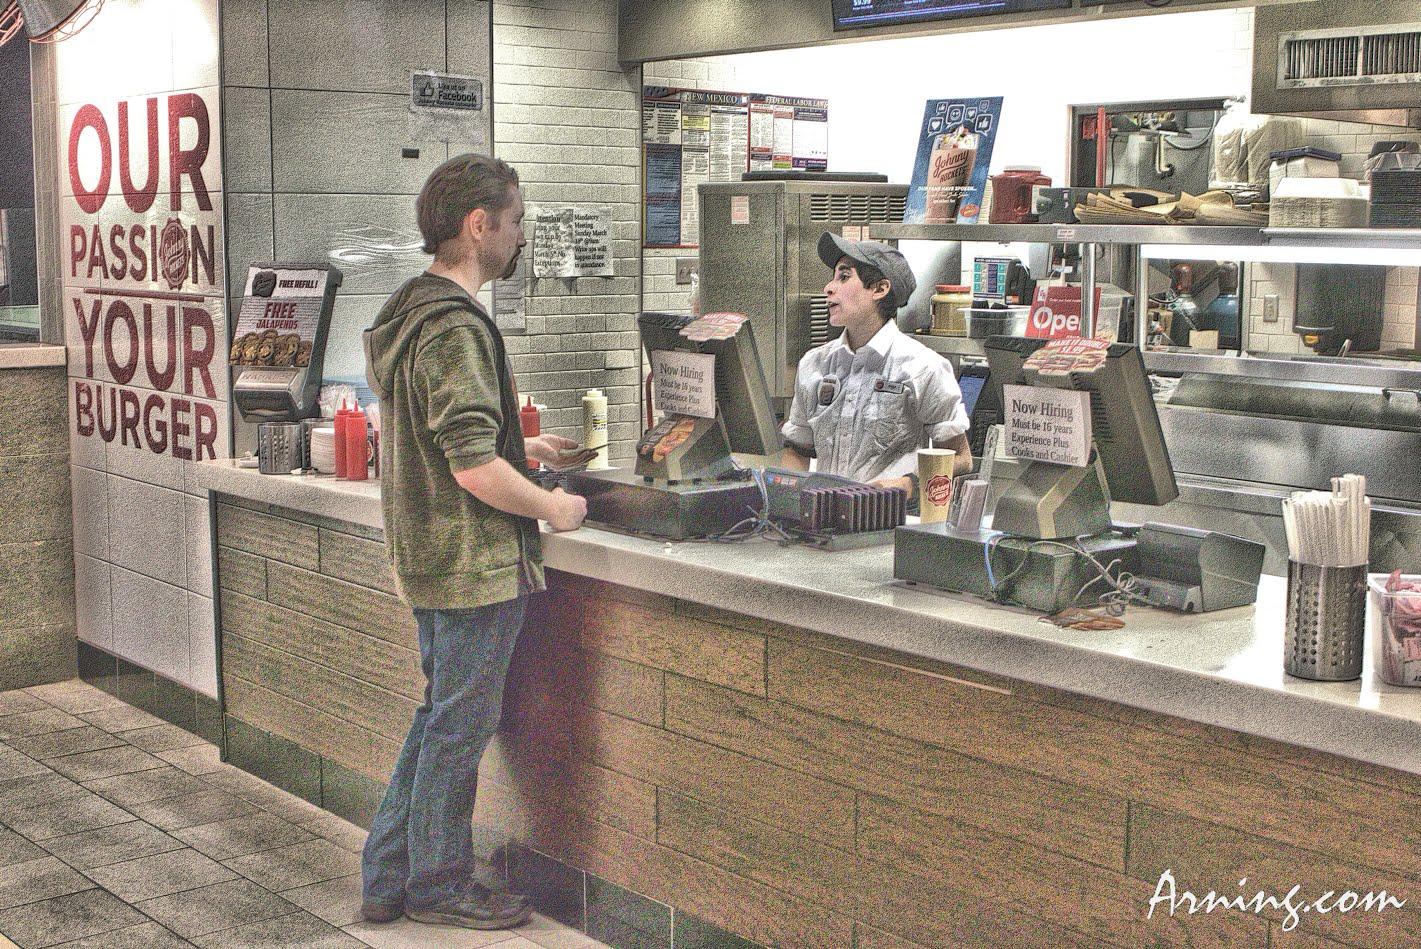 Food court at Coronado Center